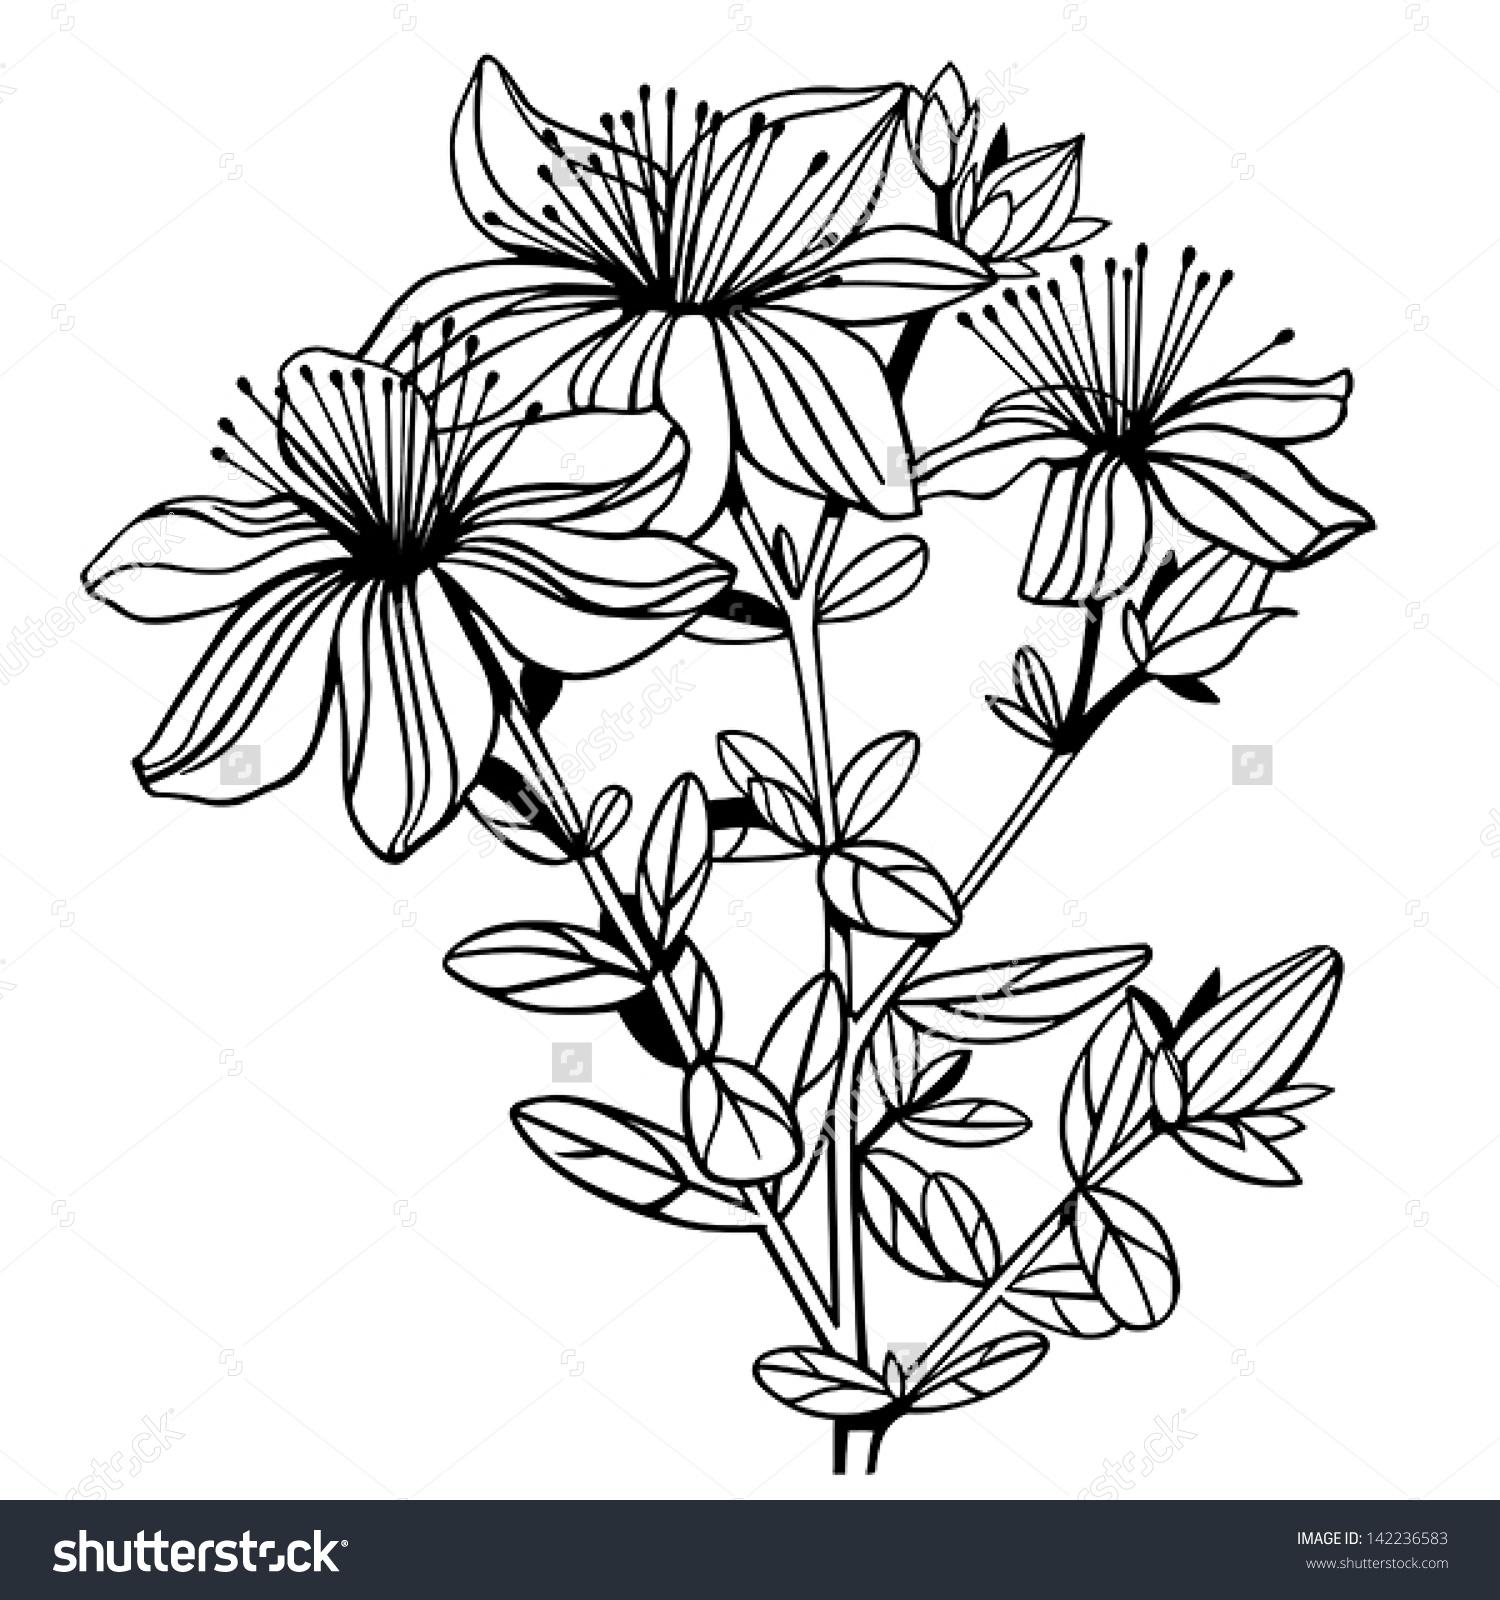 Hypericum St Johns Wort Flowers Isolated Stock Vector 142236583.